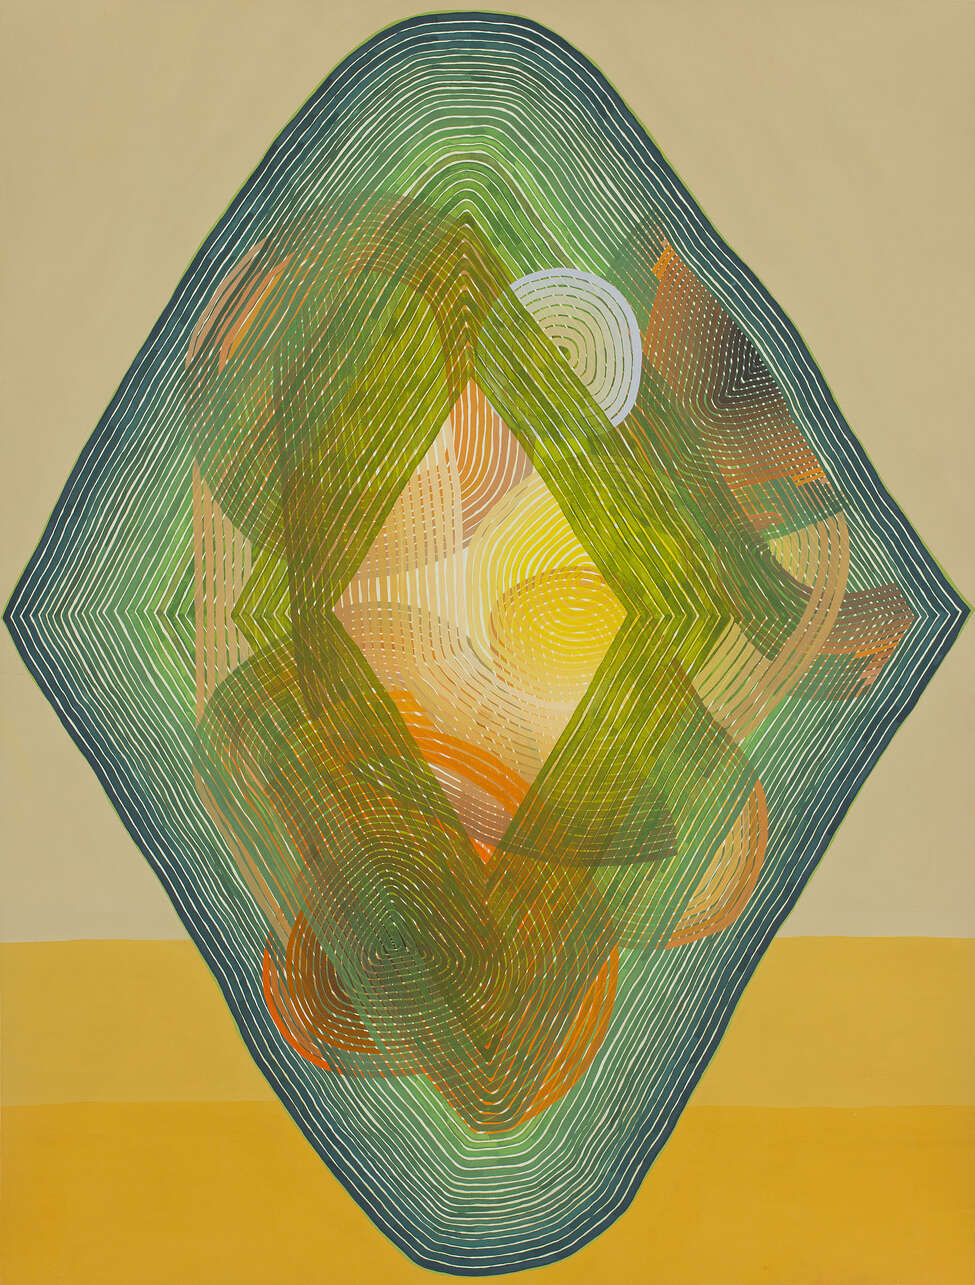 Jenny Kemp, Mellow Yellow, 2013, Gouche on paper, 30 x 20